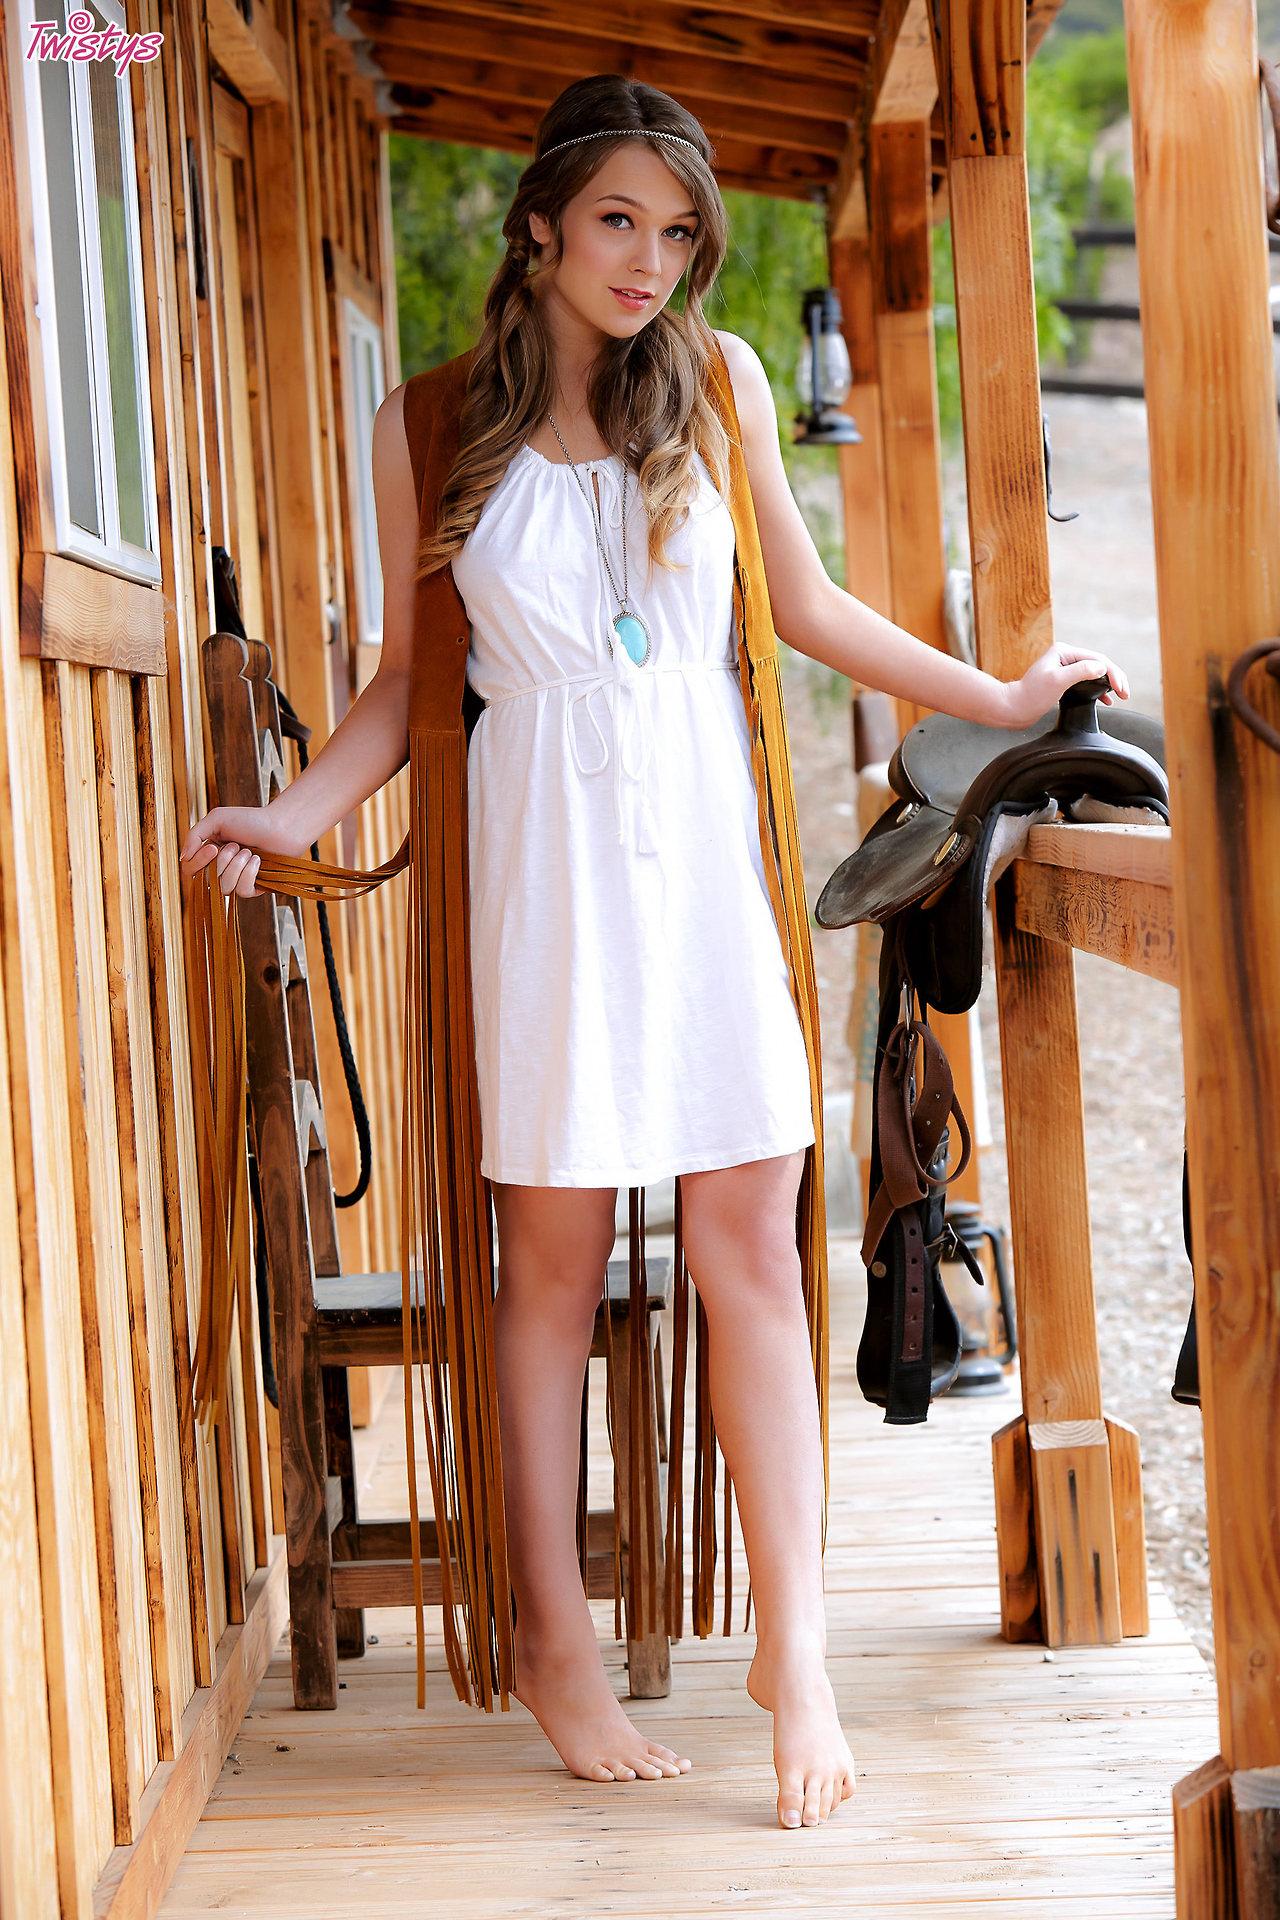 Alaina Fox – Good Ol' Usofa Girl Next Door Type The Saddle Is T , Lets Ride 1